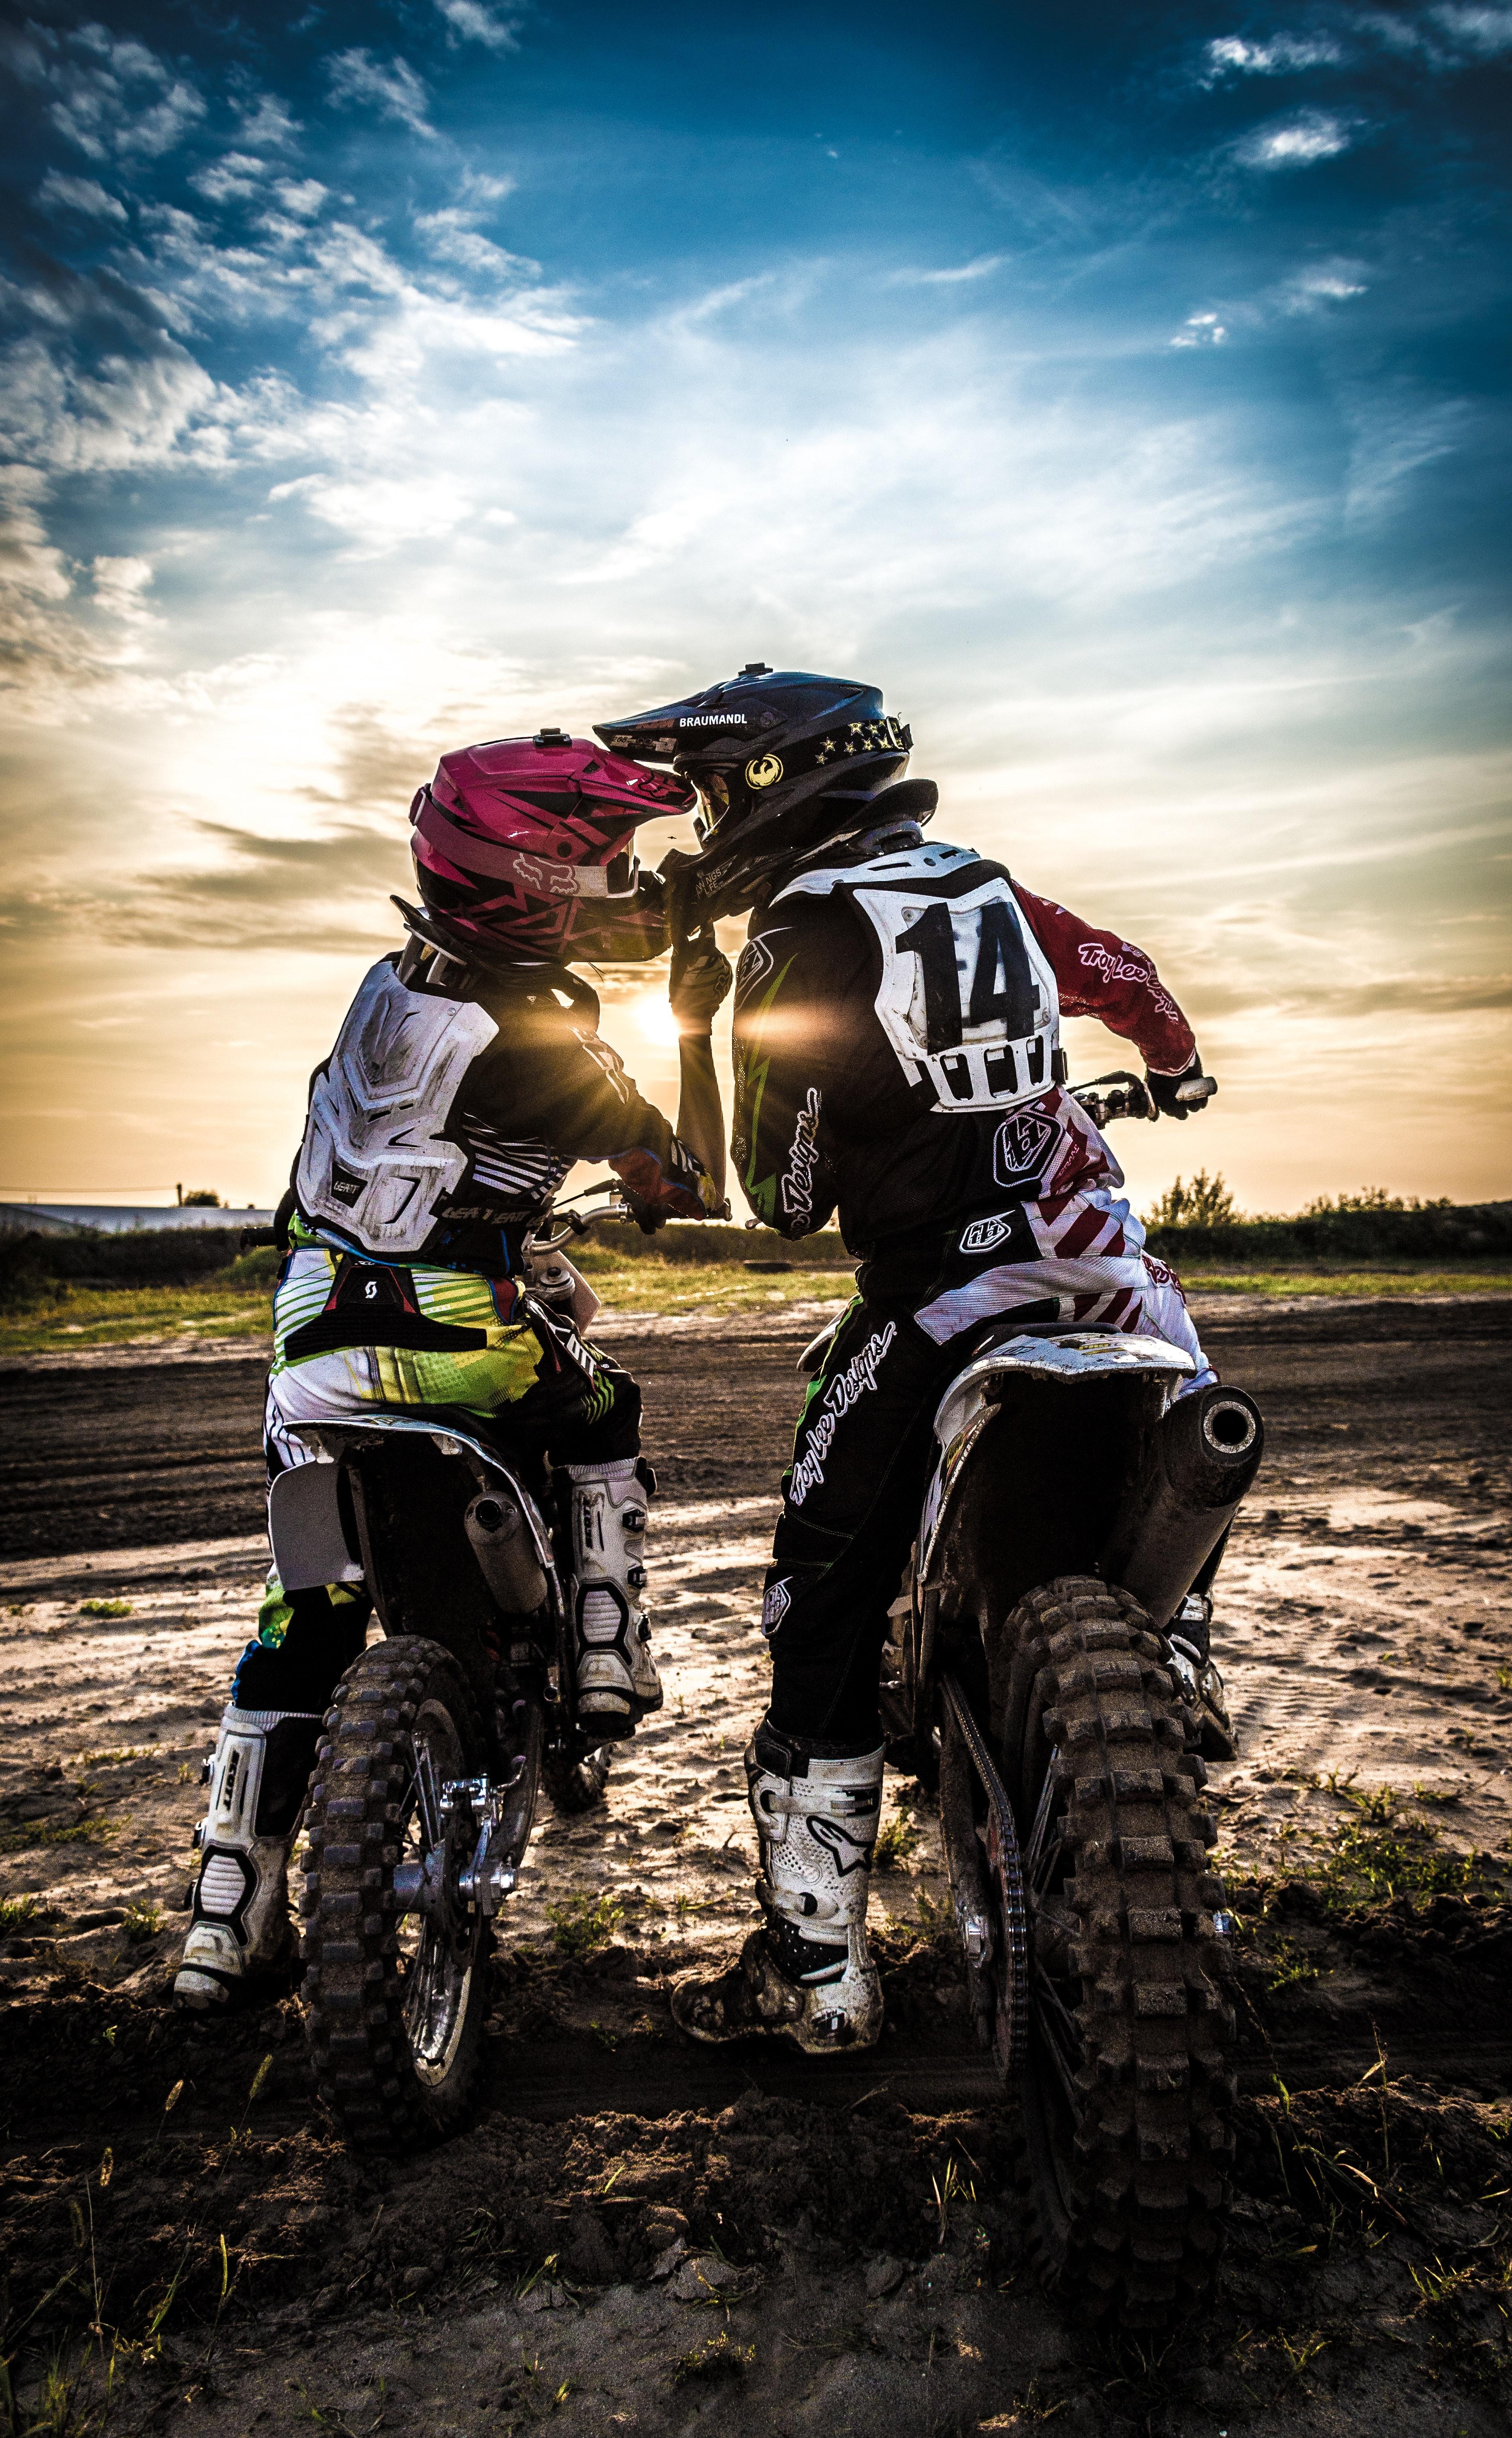 100+ amazing biker photos · pexels · free stock photos